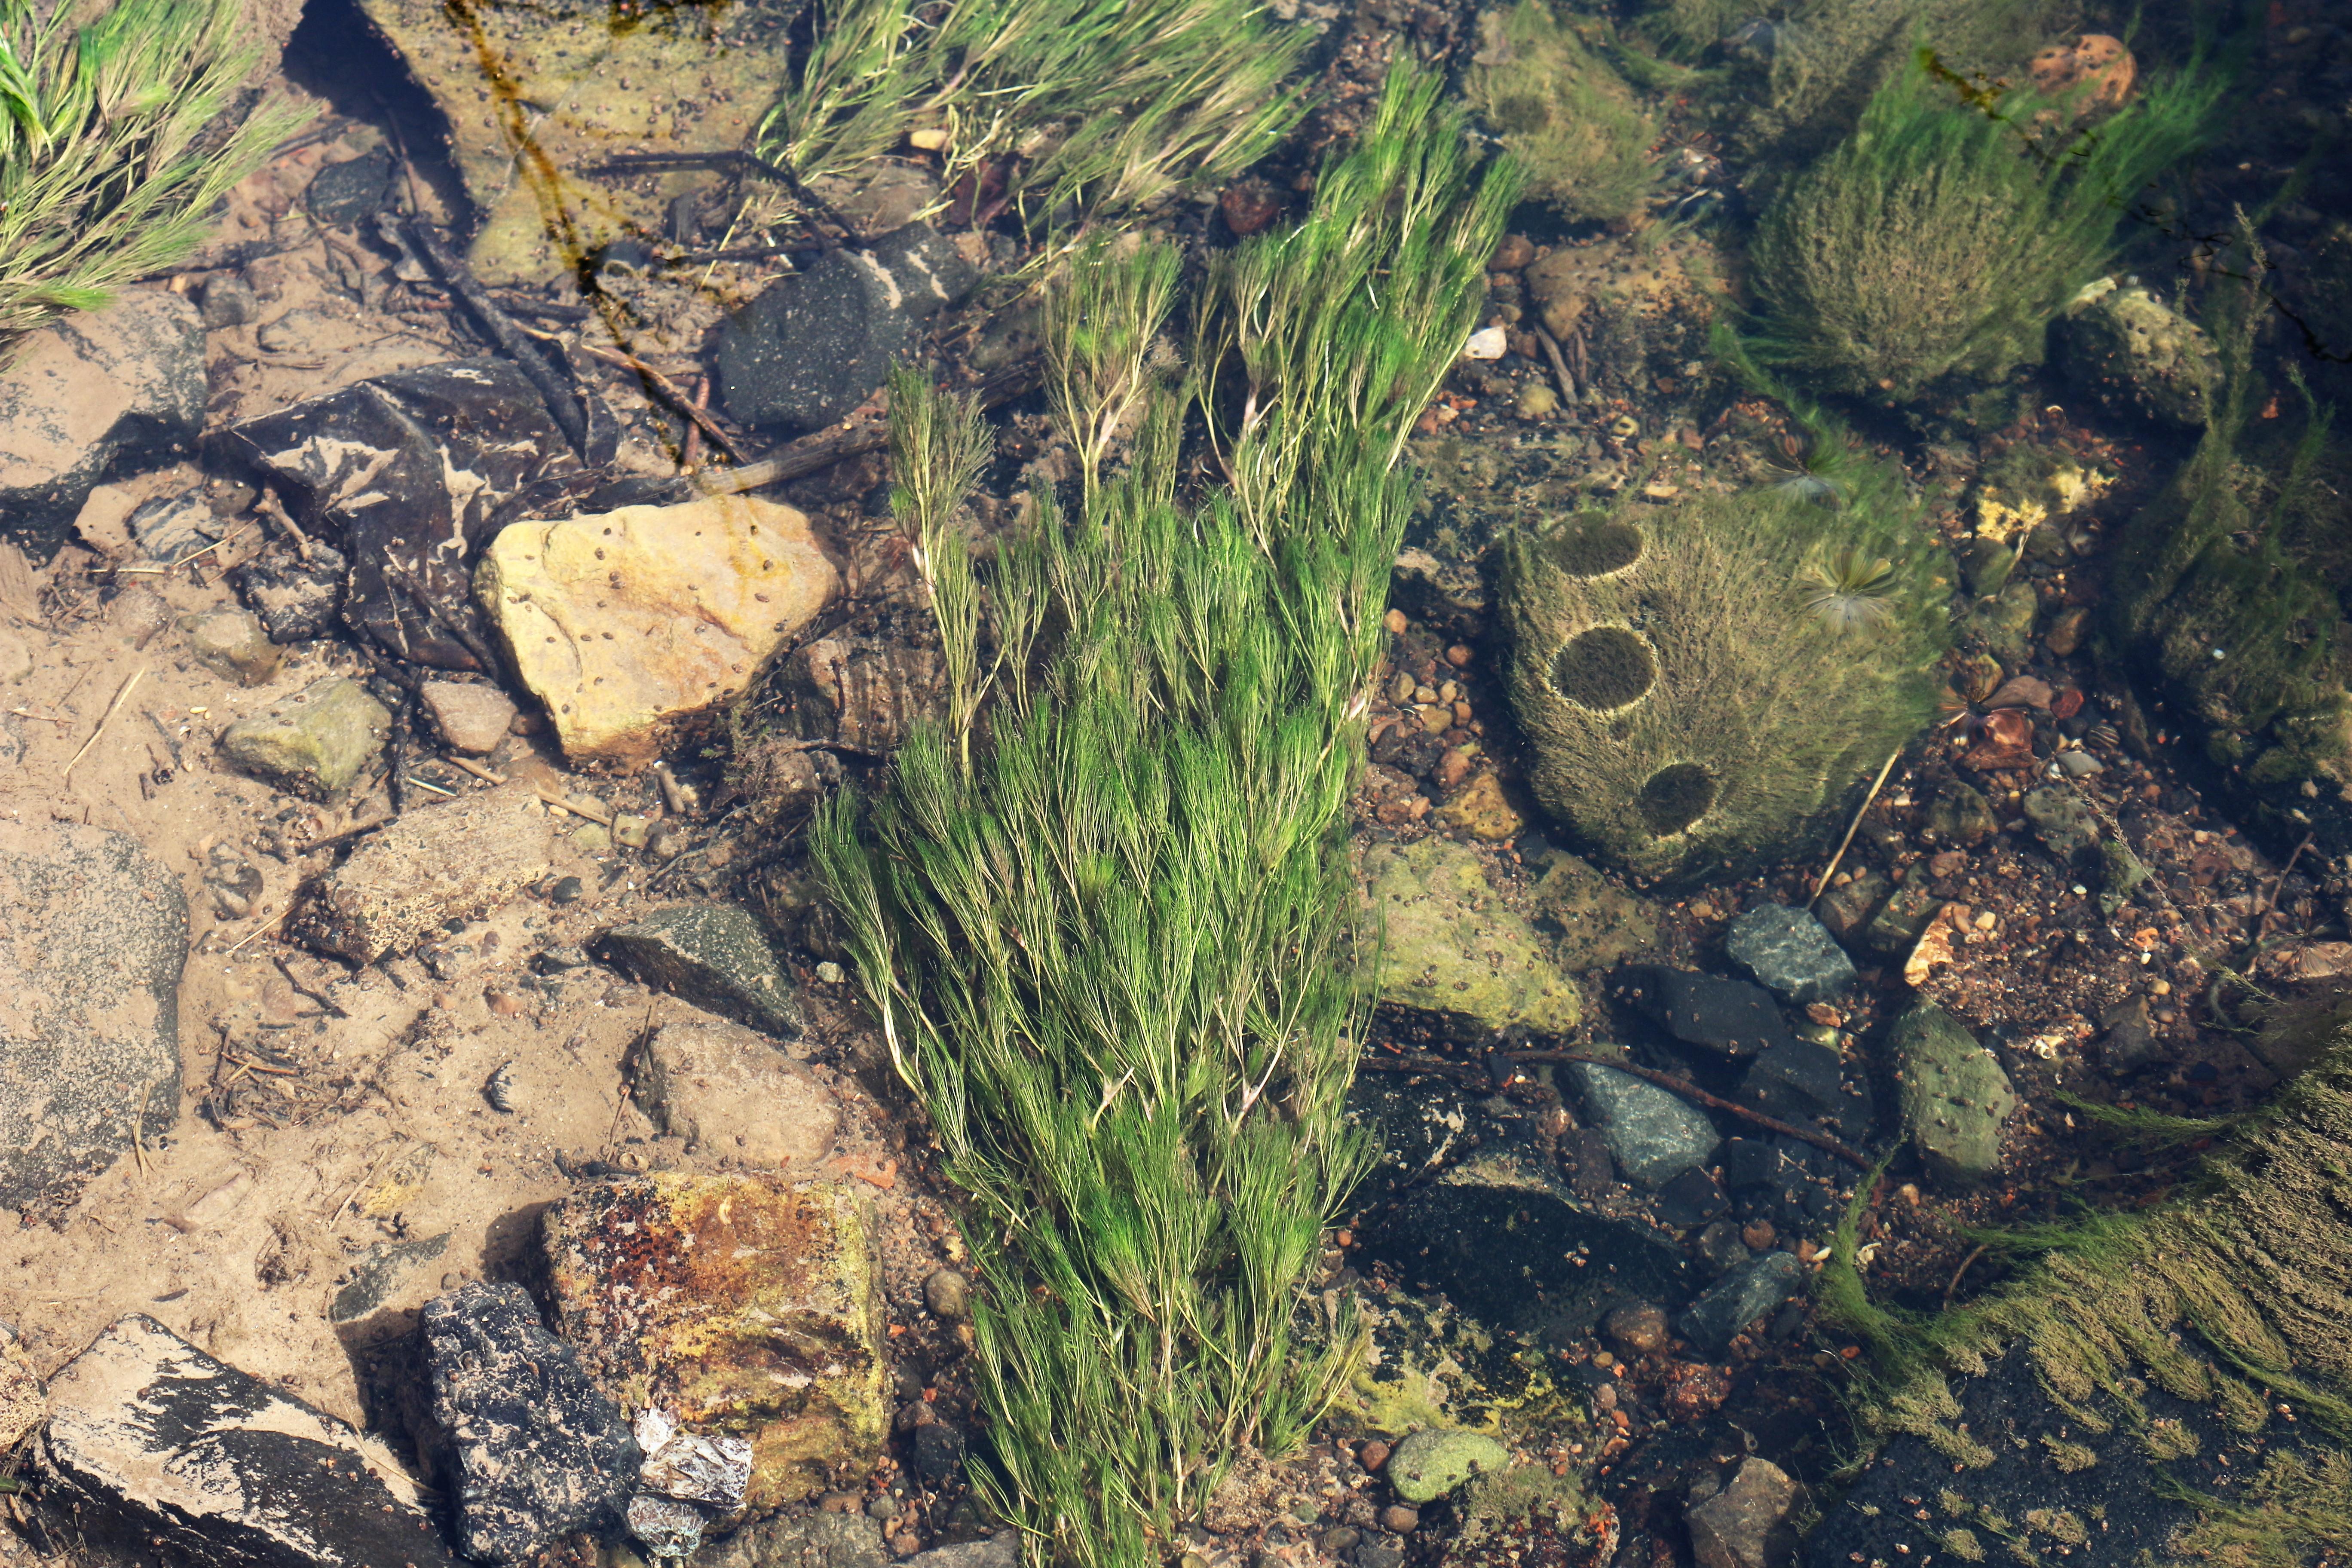 Ranunculus aquatilis. Common Water Crowfoot.